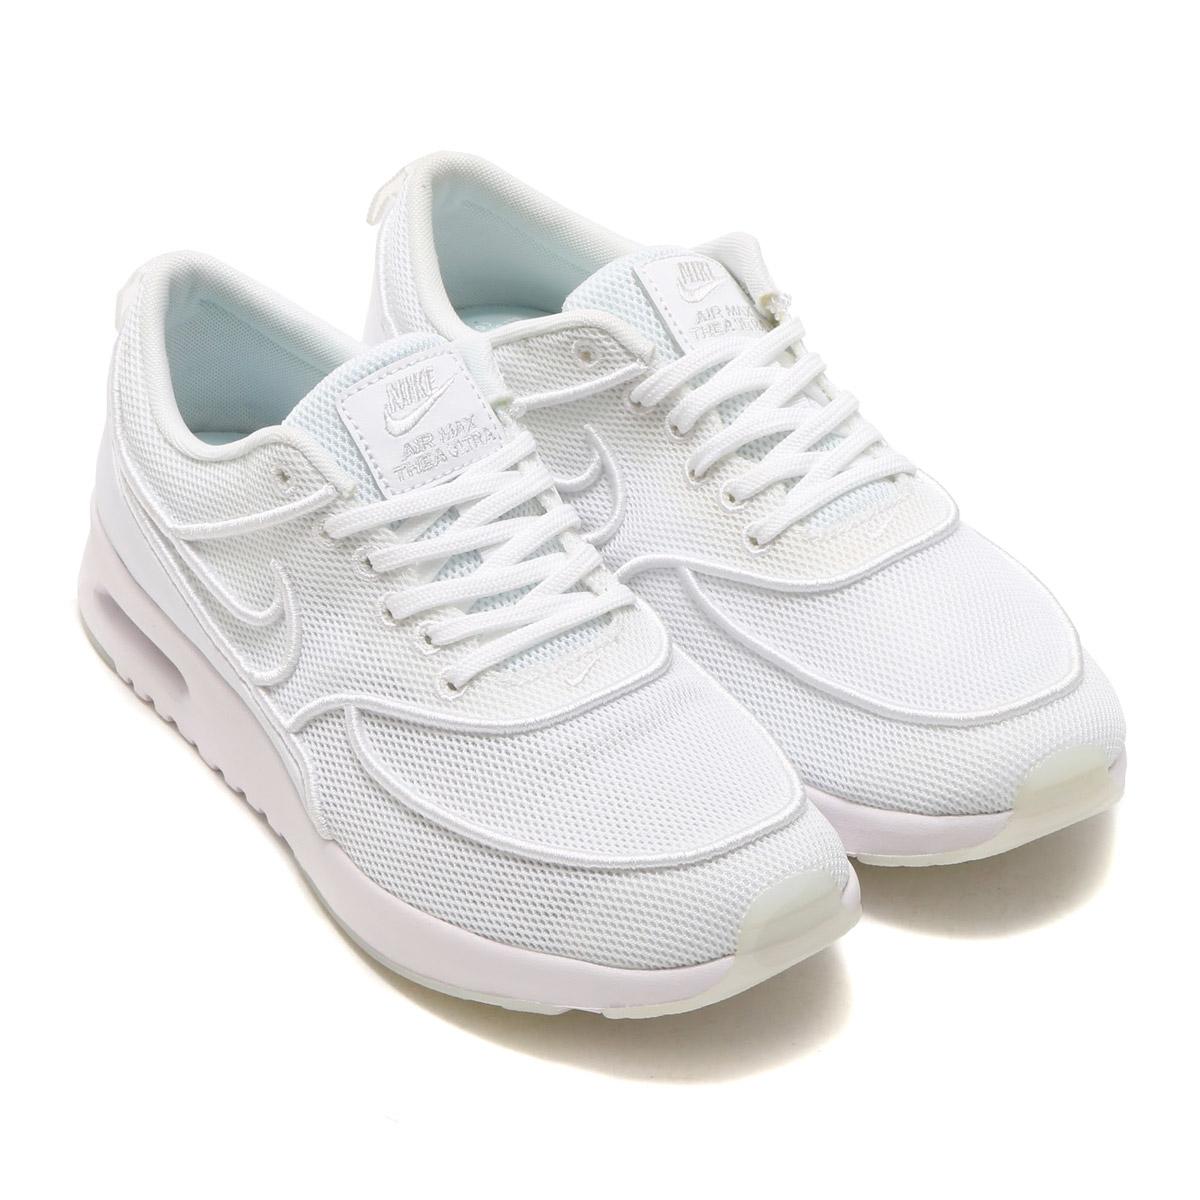 design intemporel c000c 57b66 ★SALE ★ NIKE WMNS AIR MAX THEA ULTRA SI (Nike women Air Max Shea ultra SI)  WHITE/WHITE-WOLF GREY 17SU-I